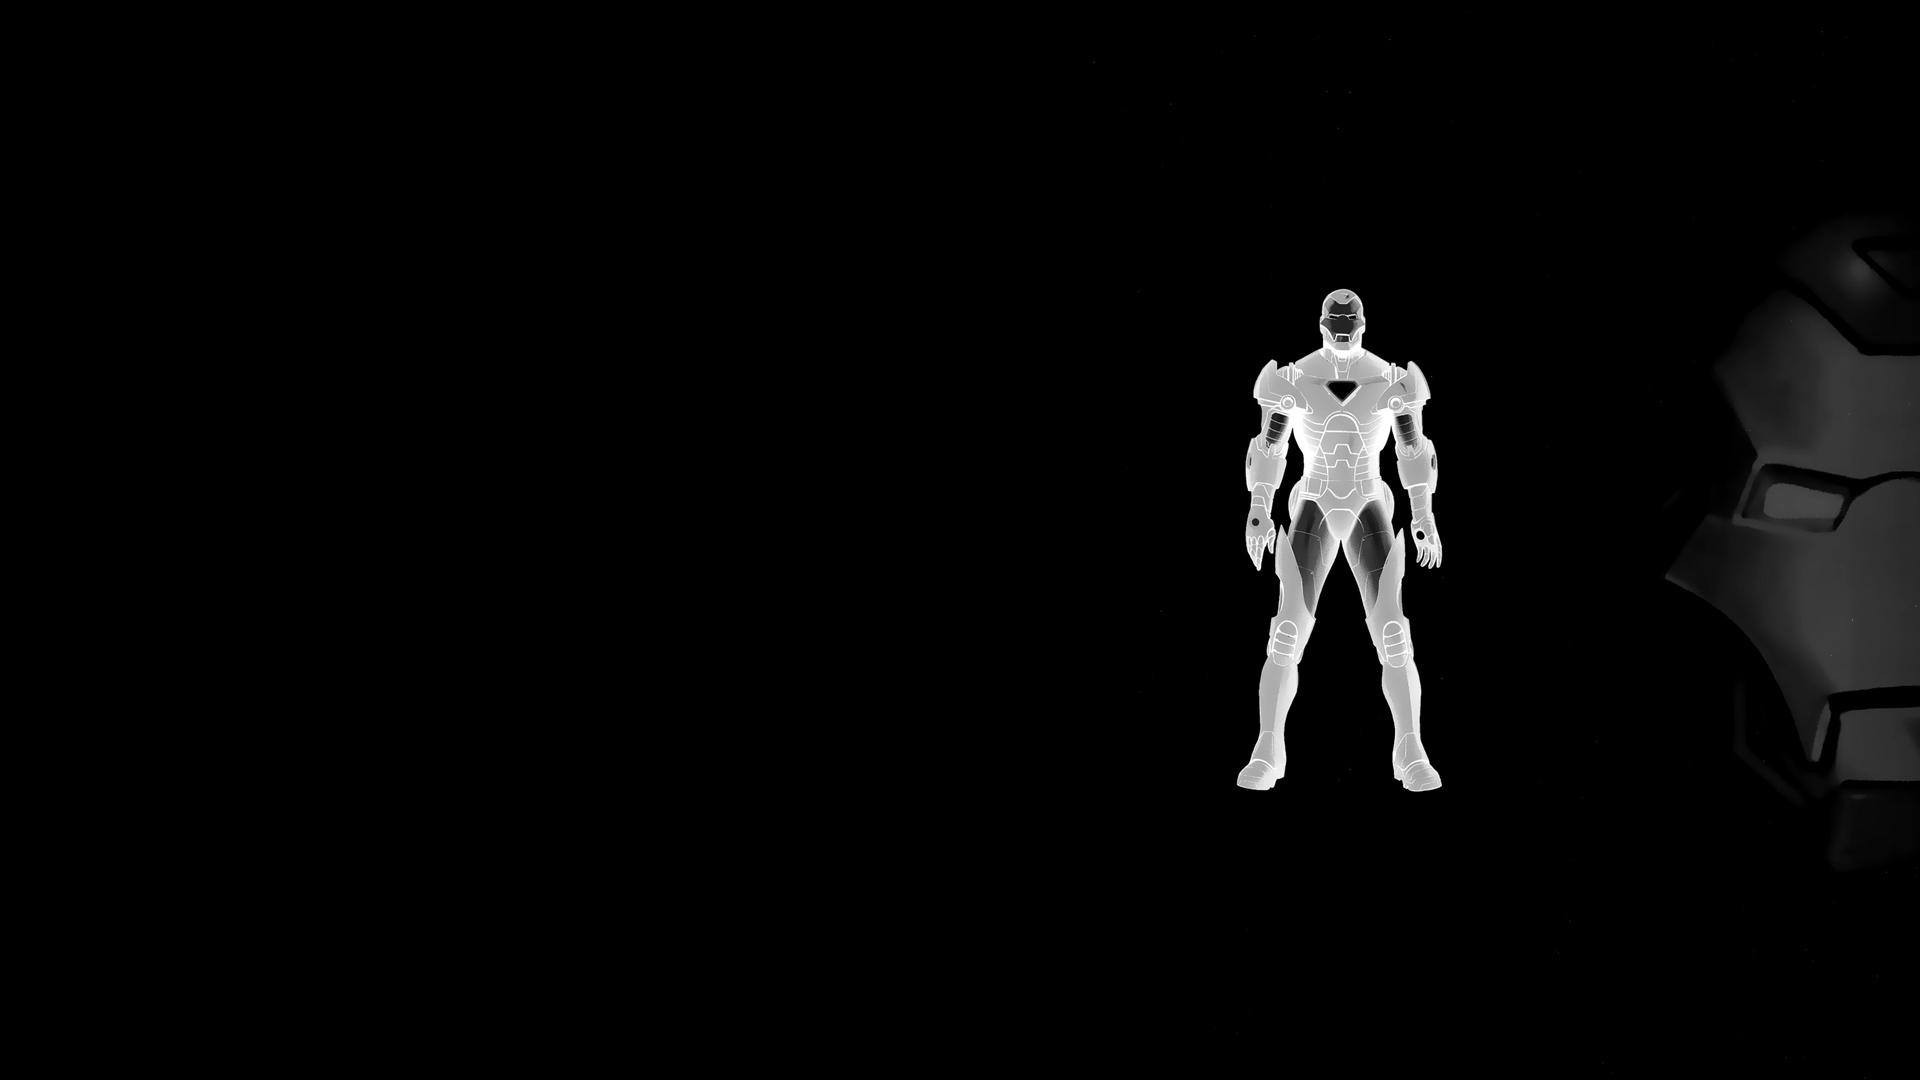 Iron Man New Hd  I Moc 21059   Free Download  HD Wallpaper